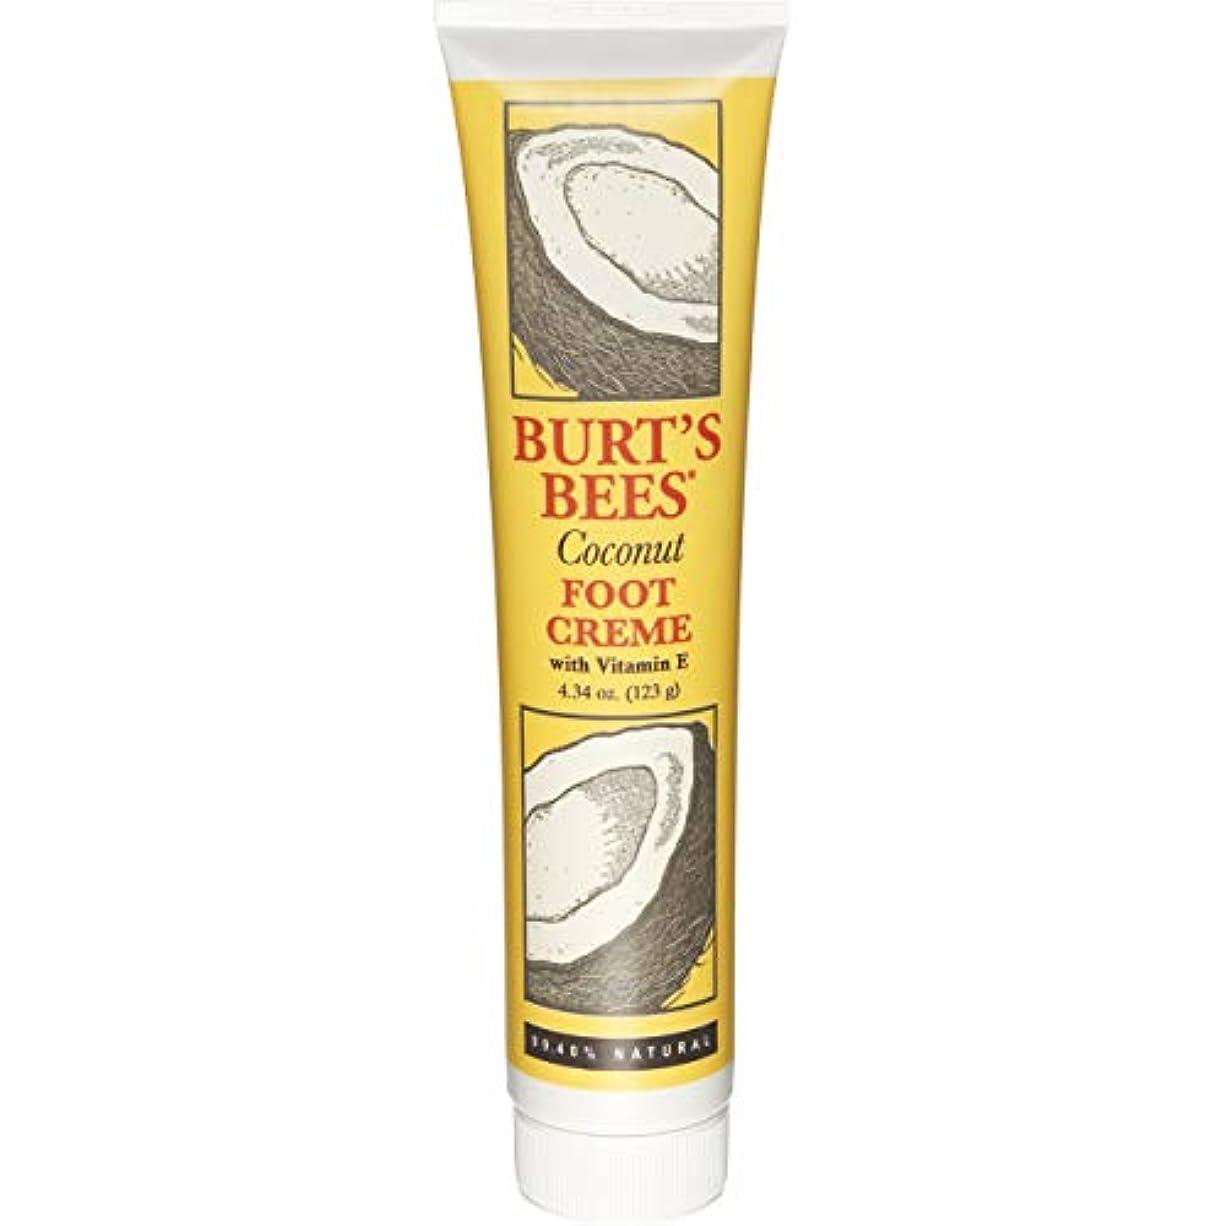 Burt's Bees, Coconut Foot Creme 4oz by Burt's Bees